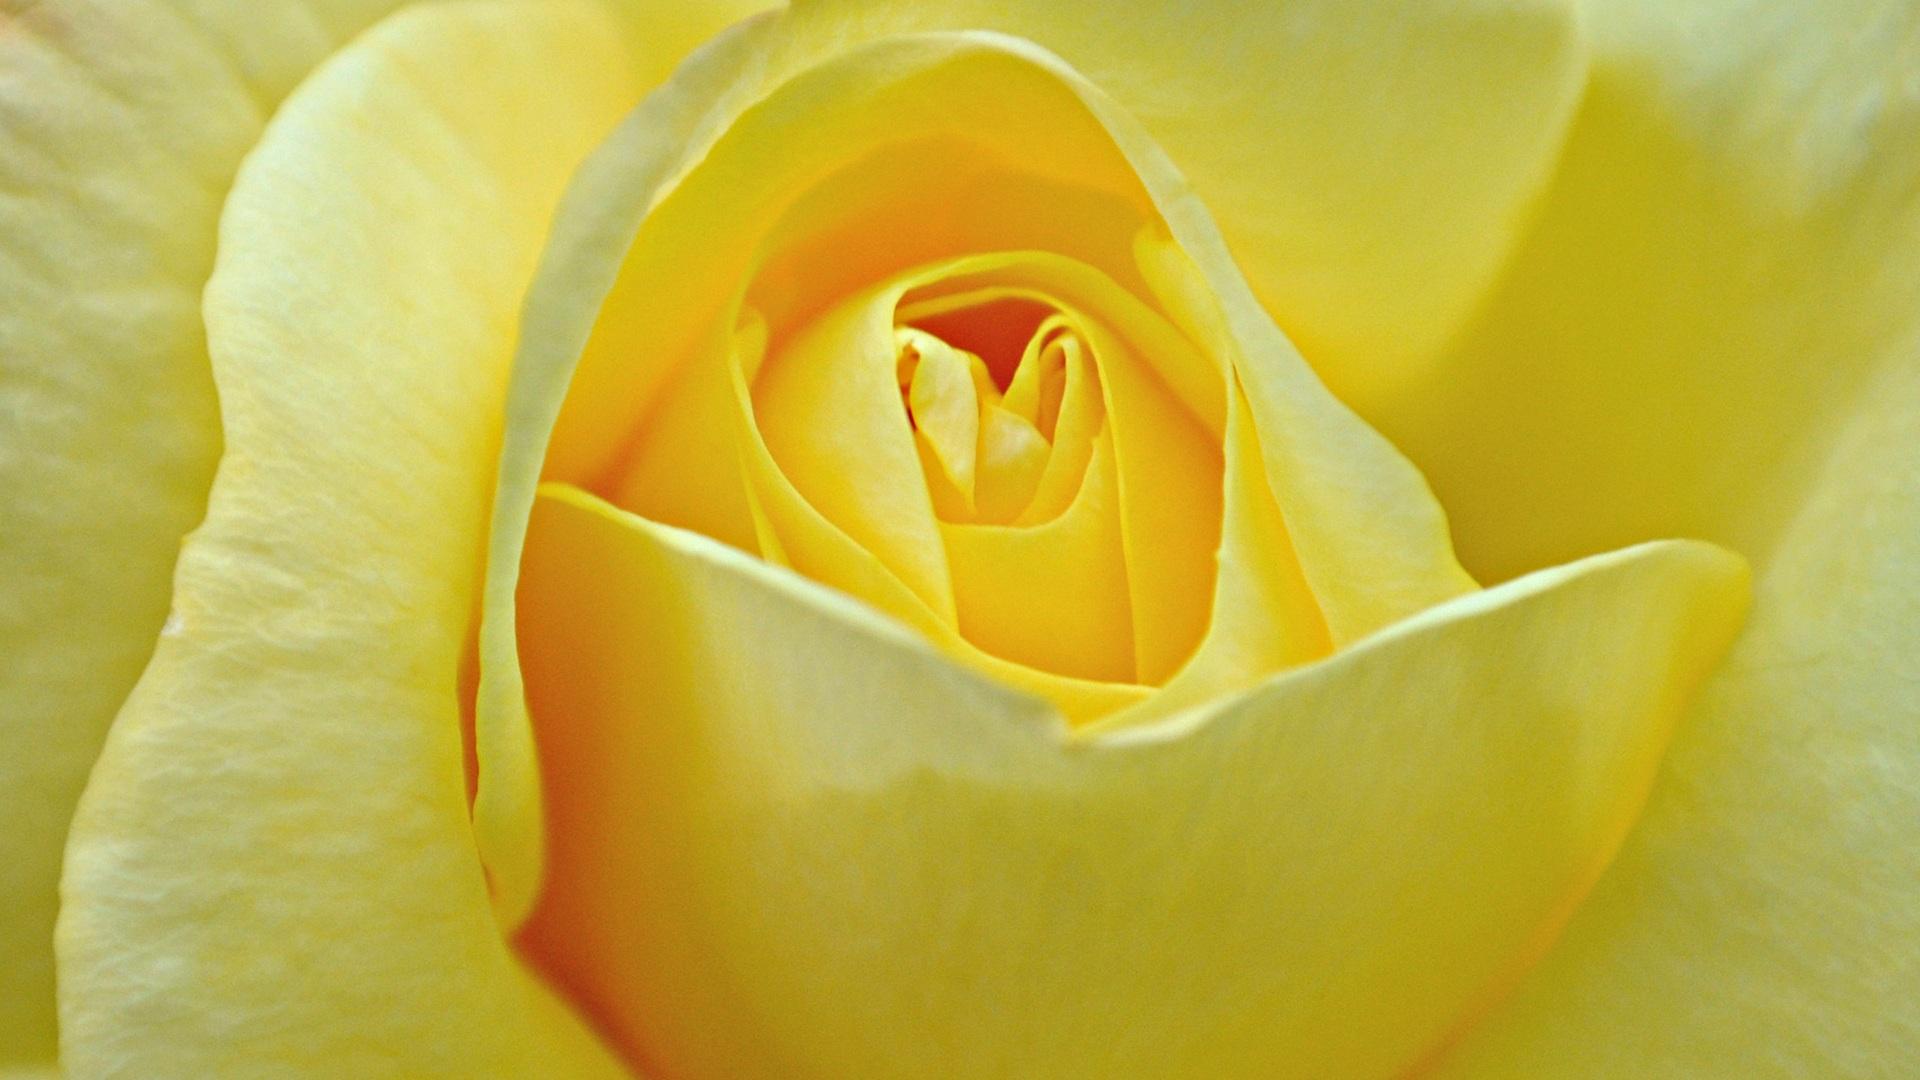 Hd wallpaper yellow flowers - Yellow Rose Wallpaper Flower